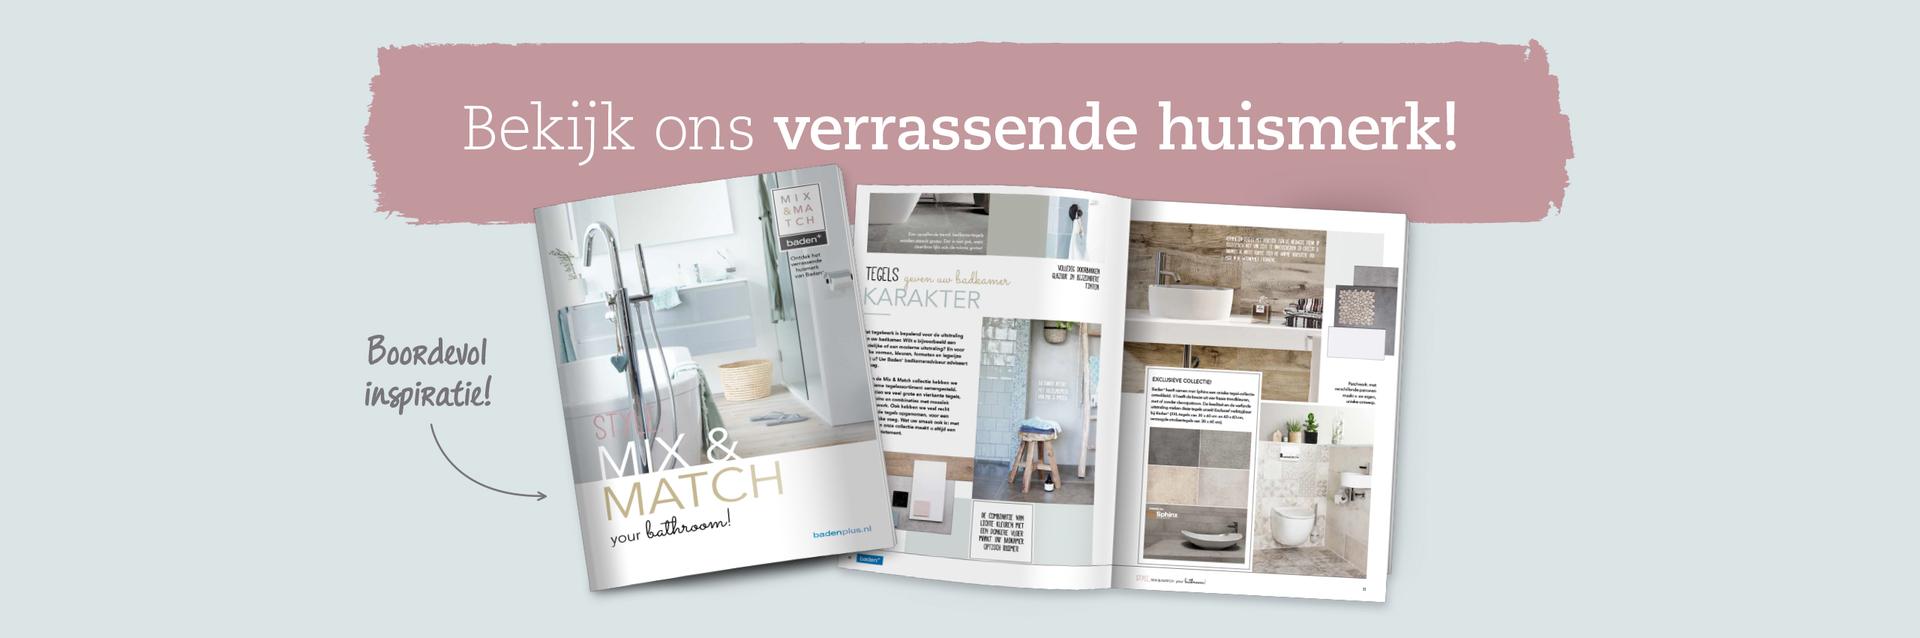 Mix & Match huismerkbrochure - Mix & Match huismerkbrochure